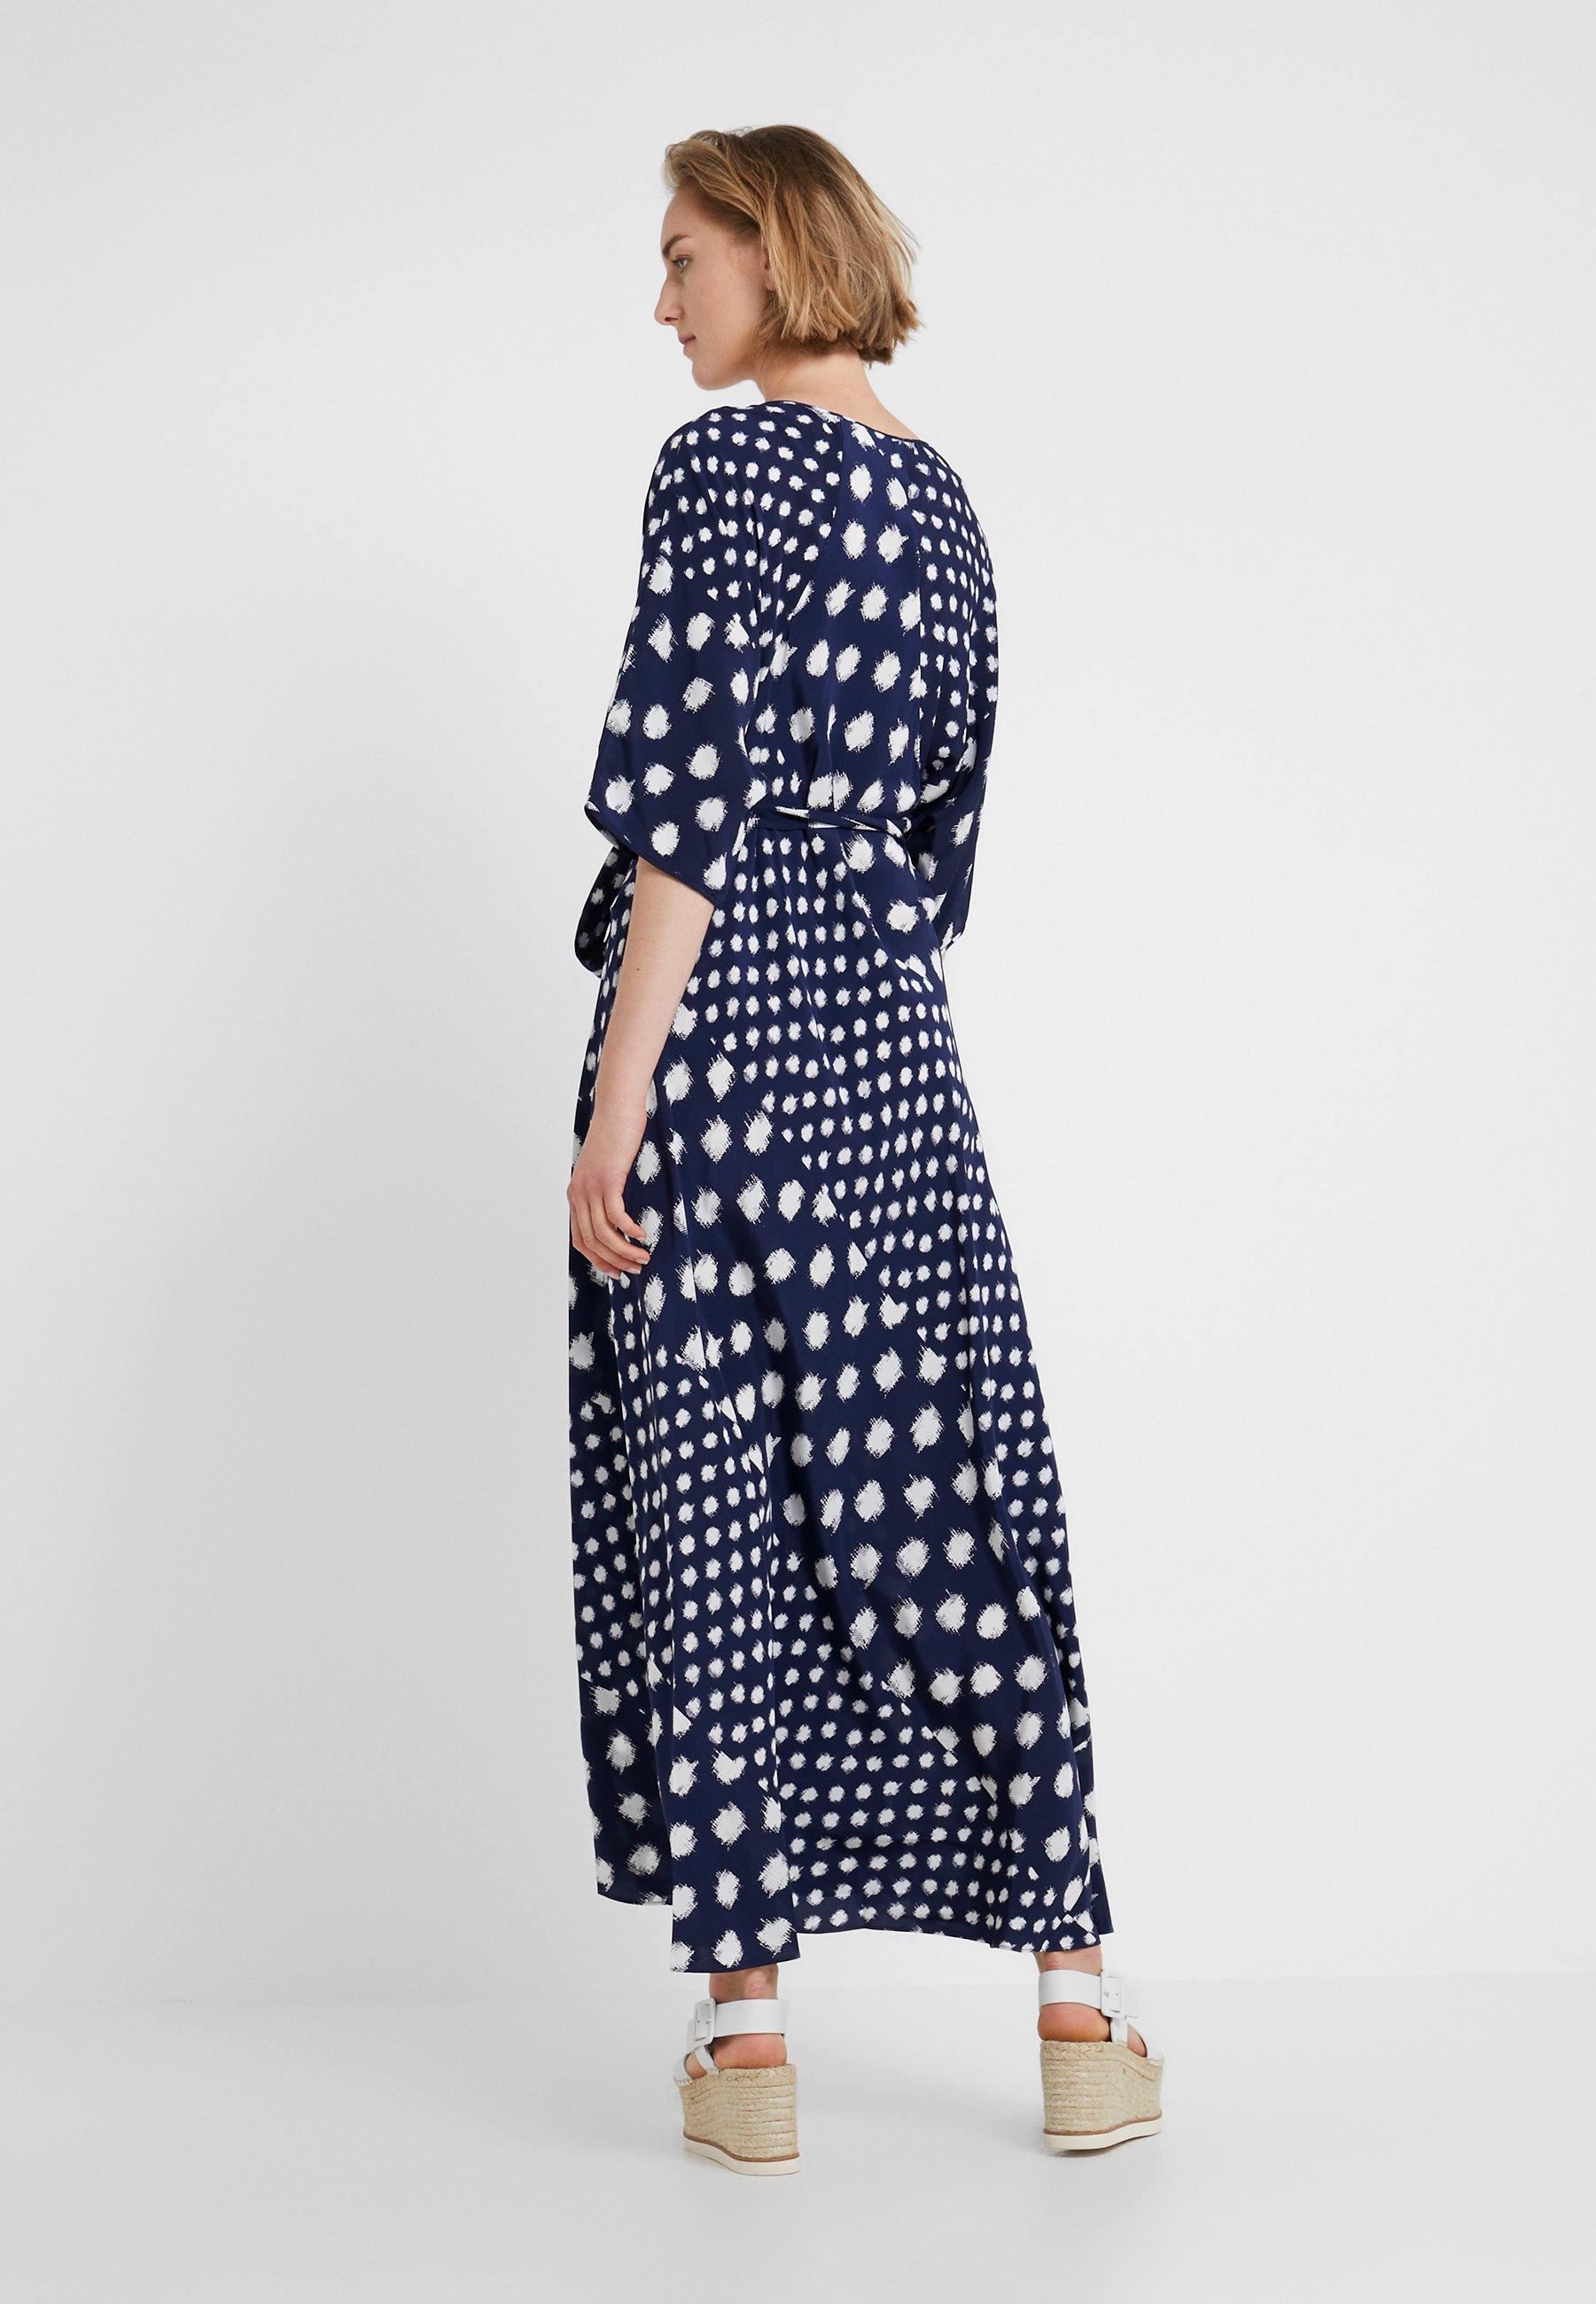 Batik New Von EloiseRobe Navy Diane Longue Furstenberg AqRL354j